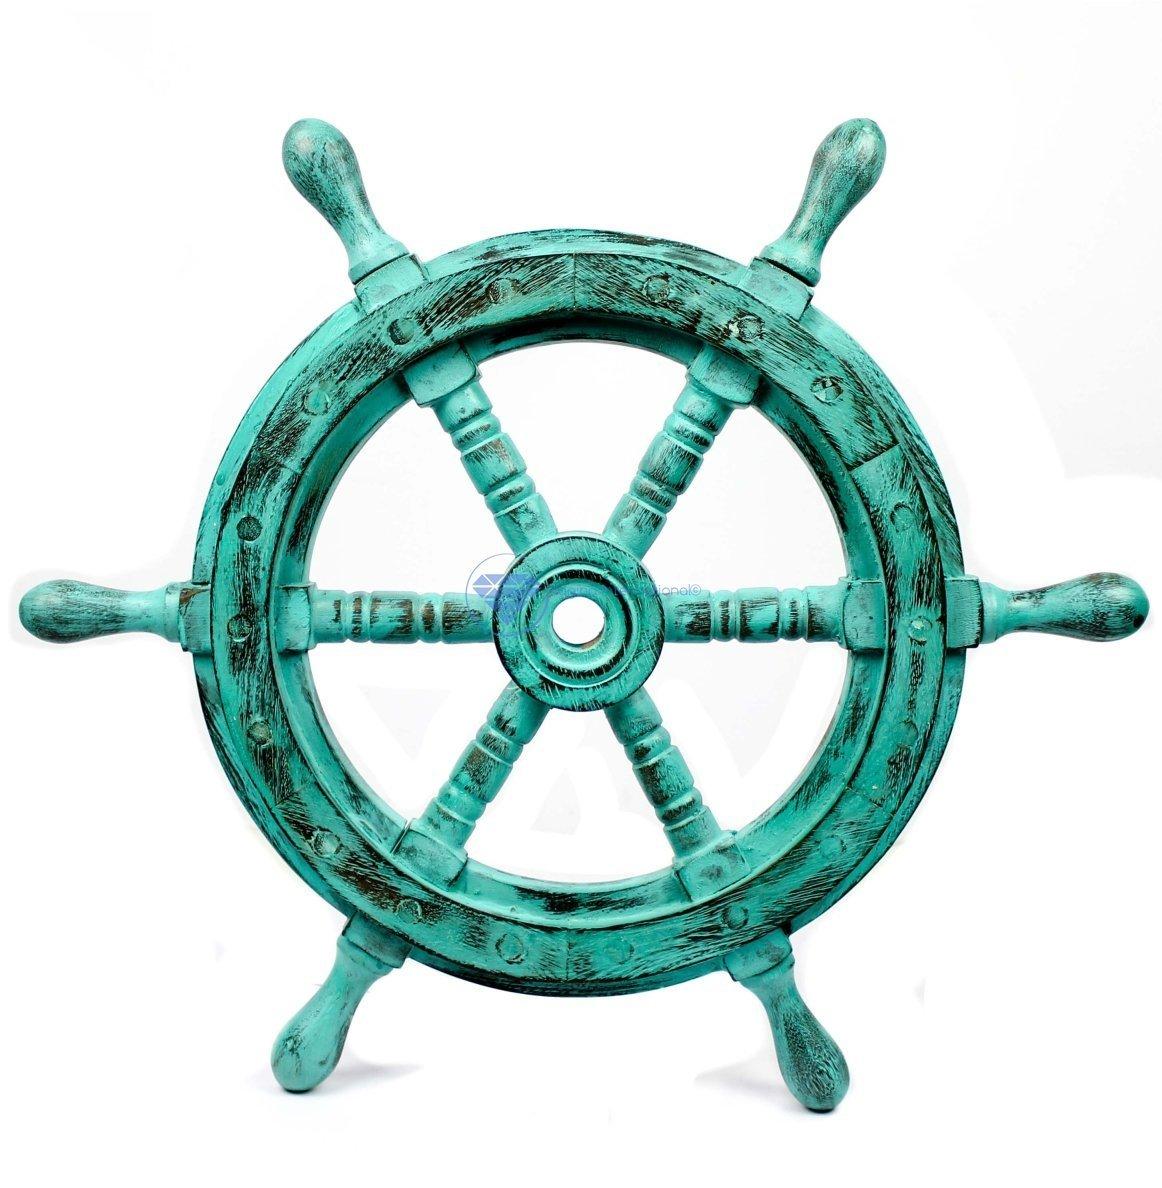 Nagina International(ナジャイナインターナショナル) Nautical高級ハンドクラフト木製操舵輪 | 海賊風家庭壁装飾&ギフト |24 Inches NWH005AG B01FVSR5IA 24 Inches|Antique Green Antique Green 24 Inches